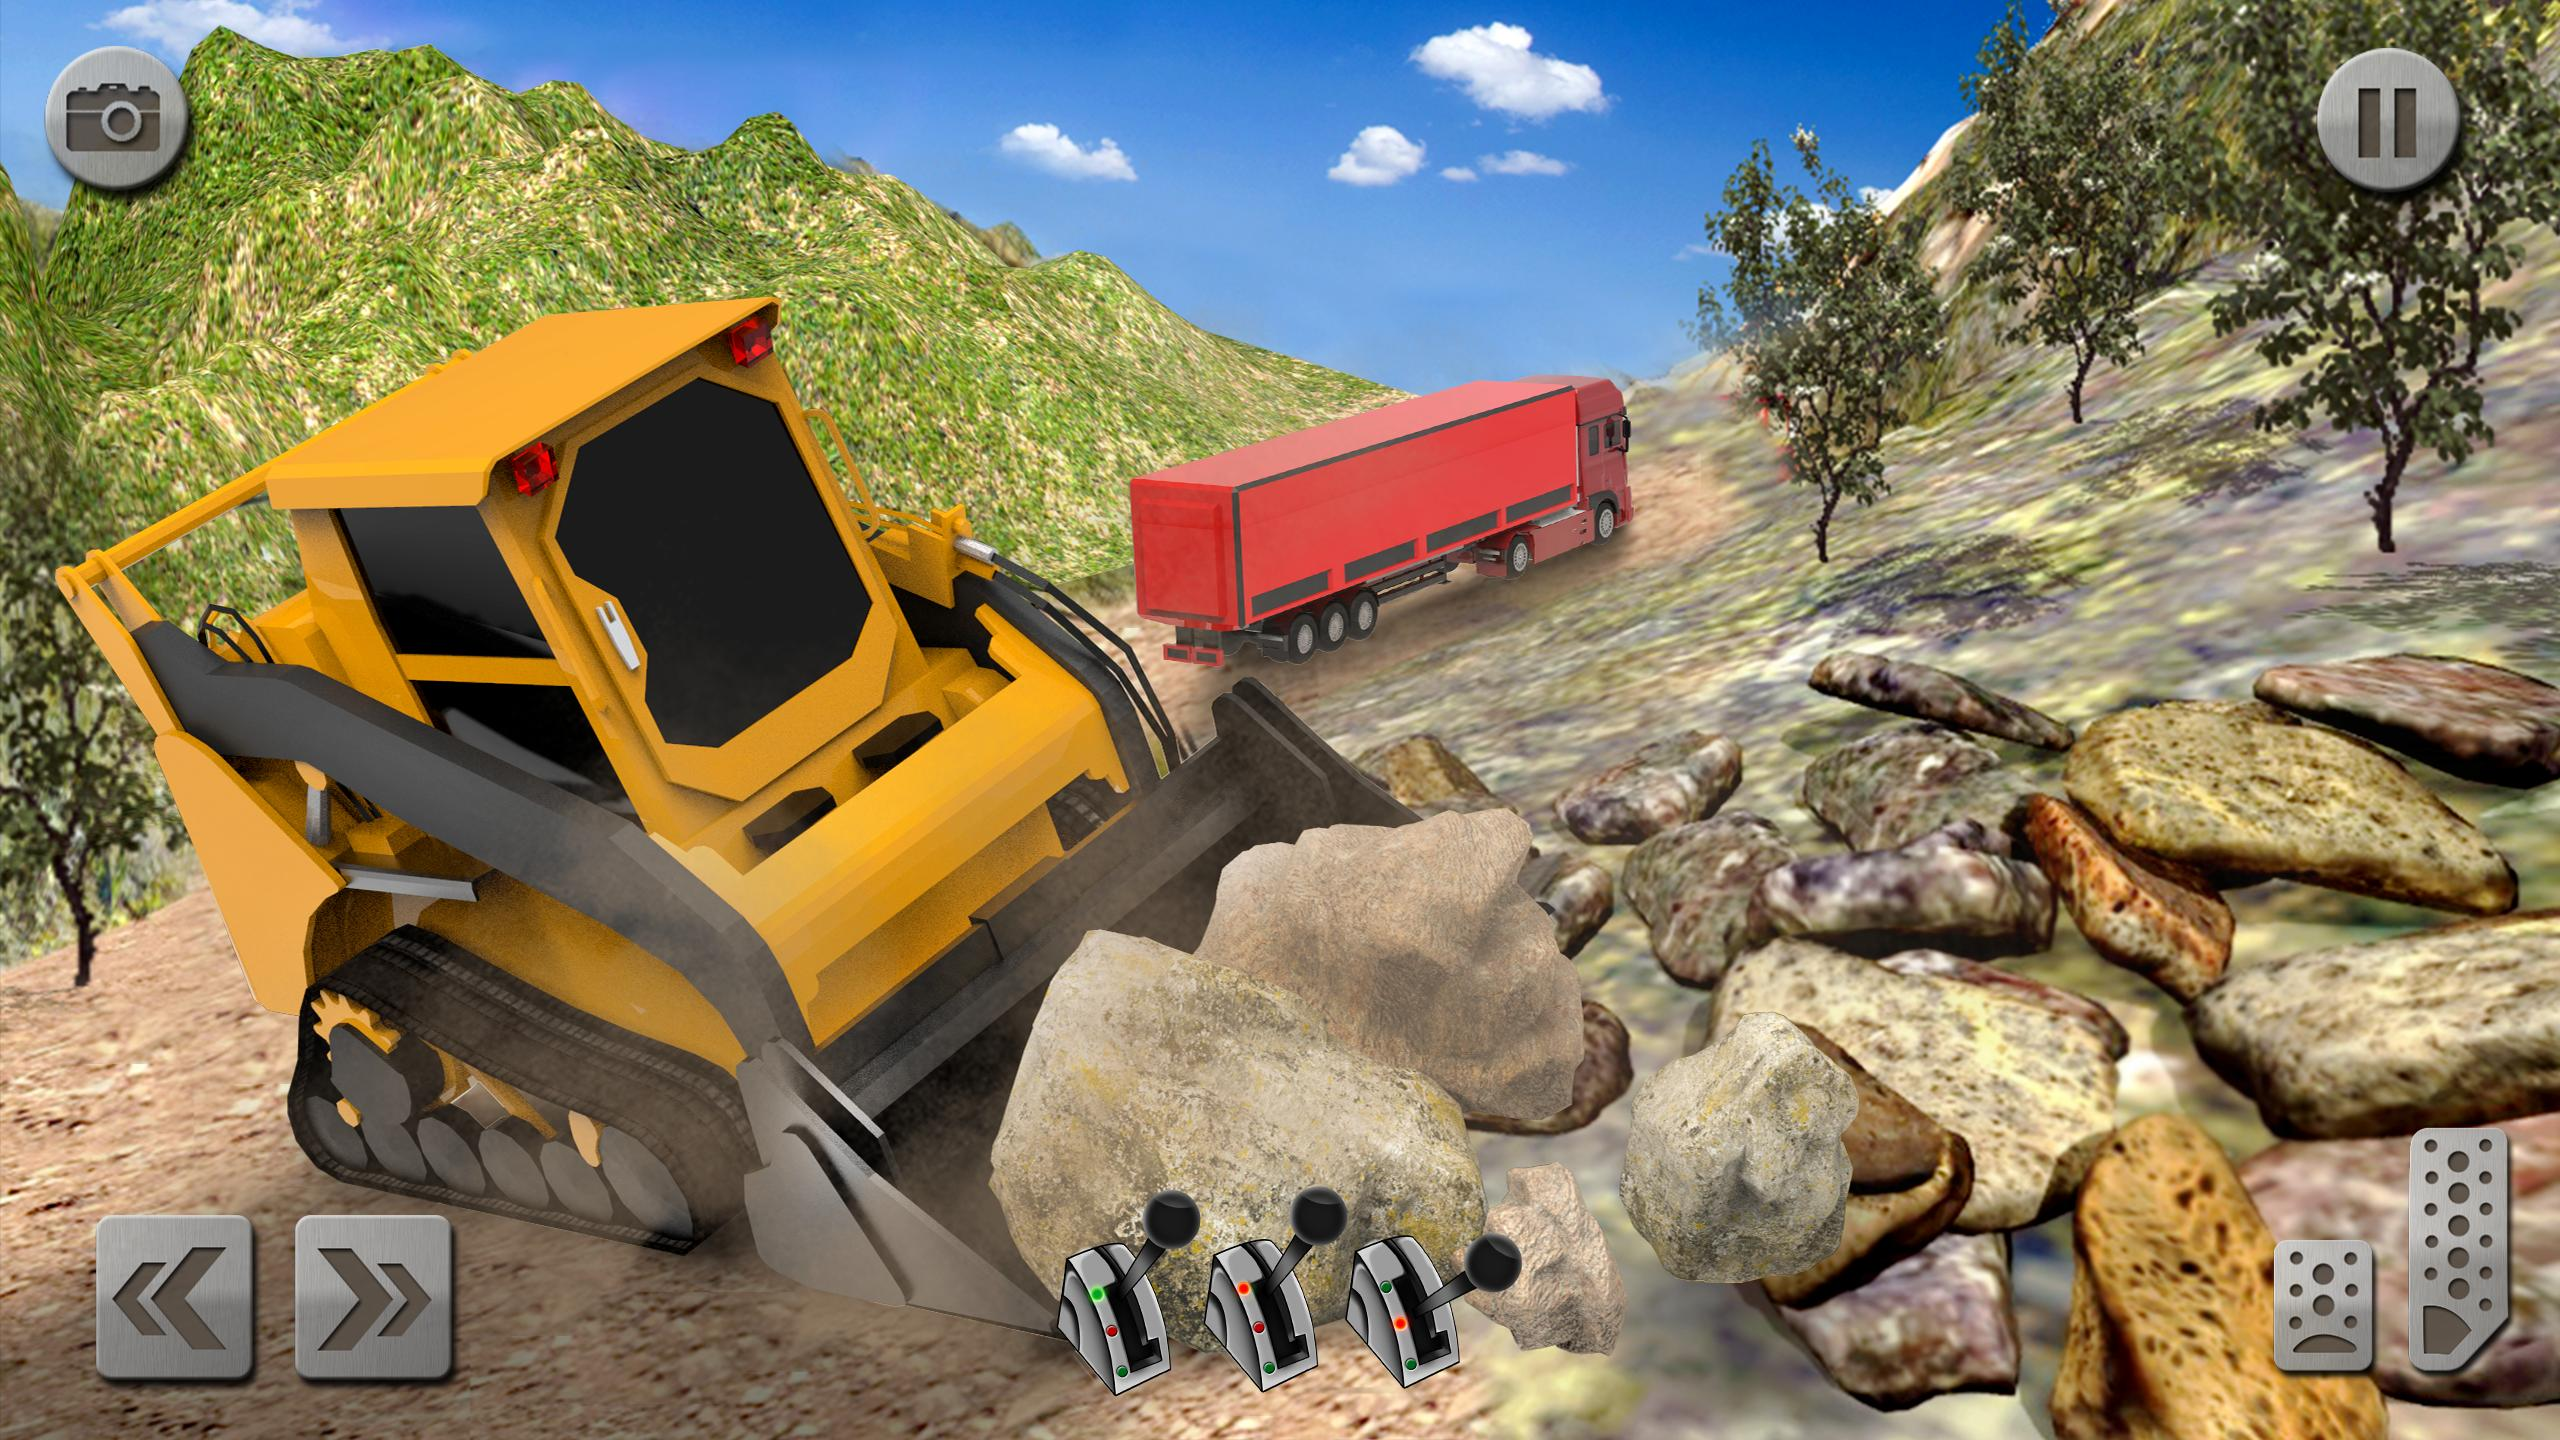 Sand Excavator Truck Driving Rescue Simulator game 5.2 Screenshot 12